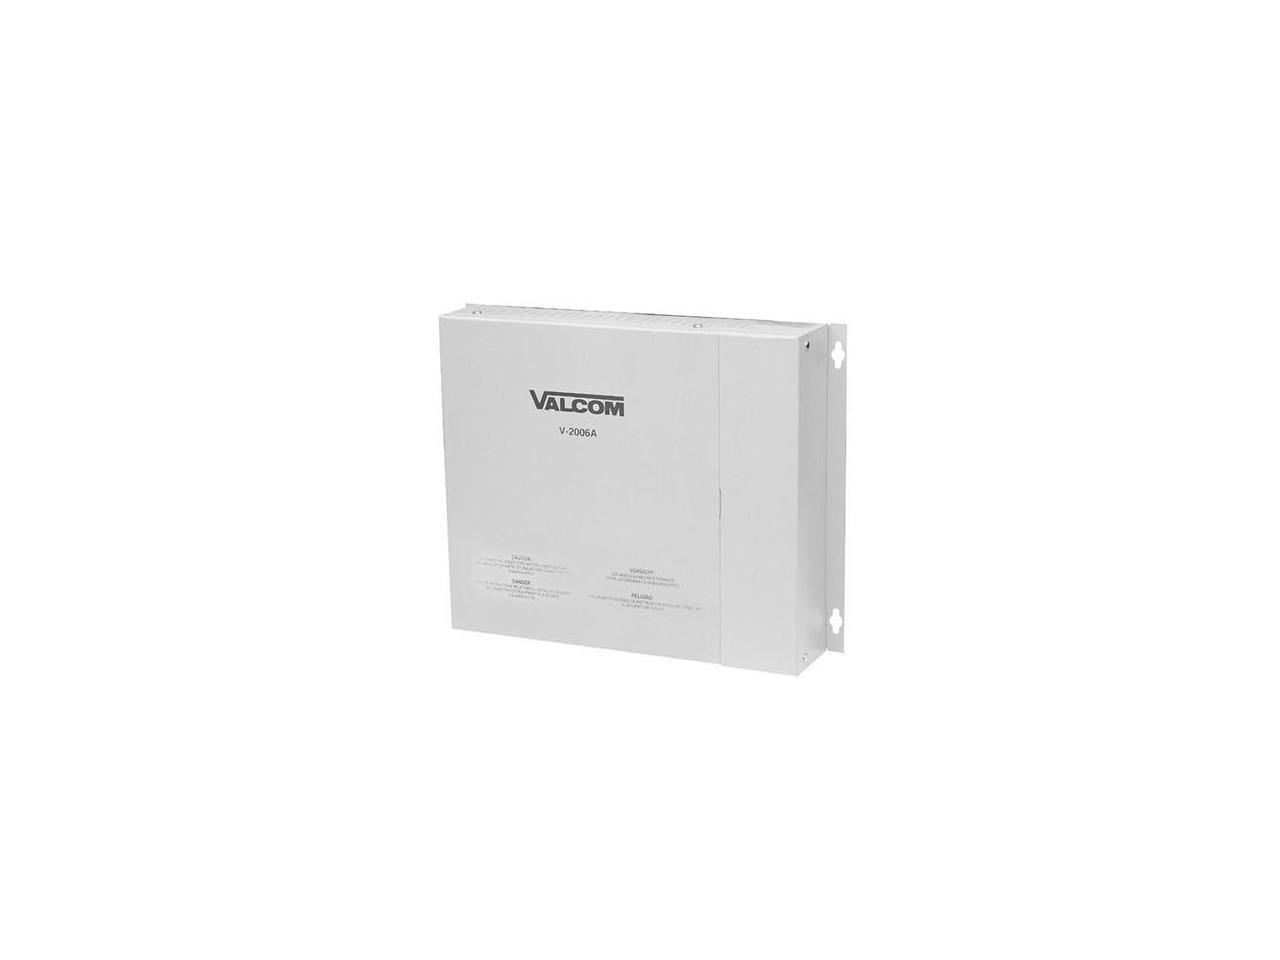 Valcom V-2006A One Way 6 Zone Page Control Unit